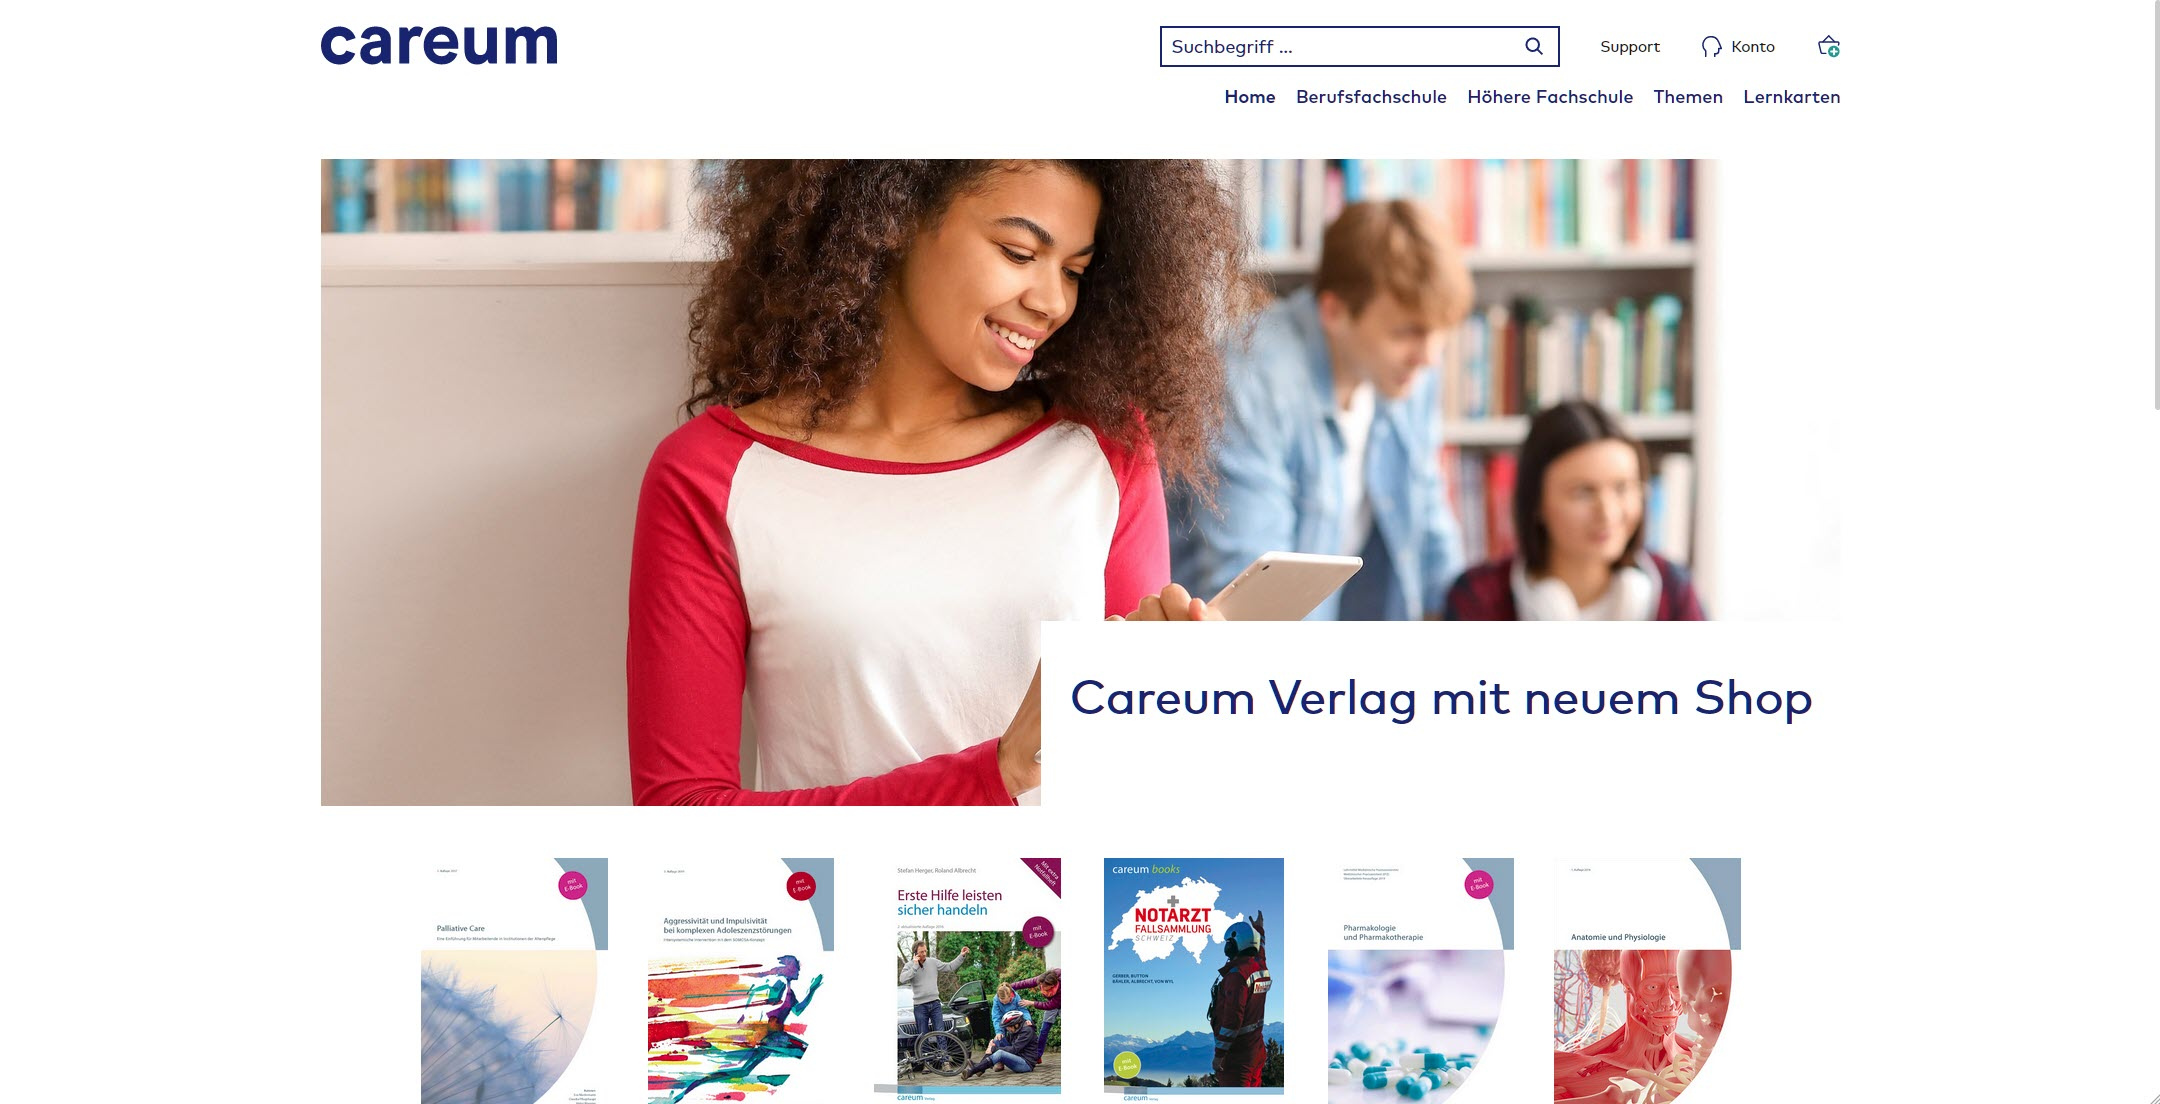 Careum_Desktop preview